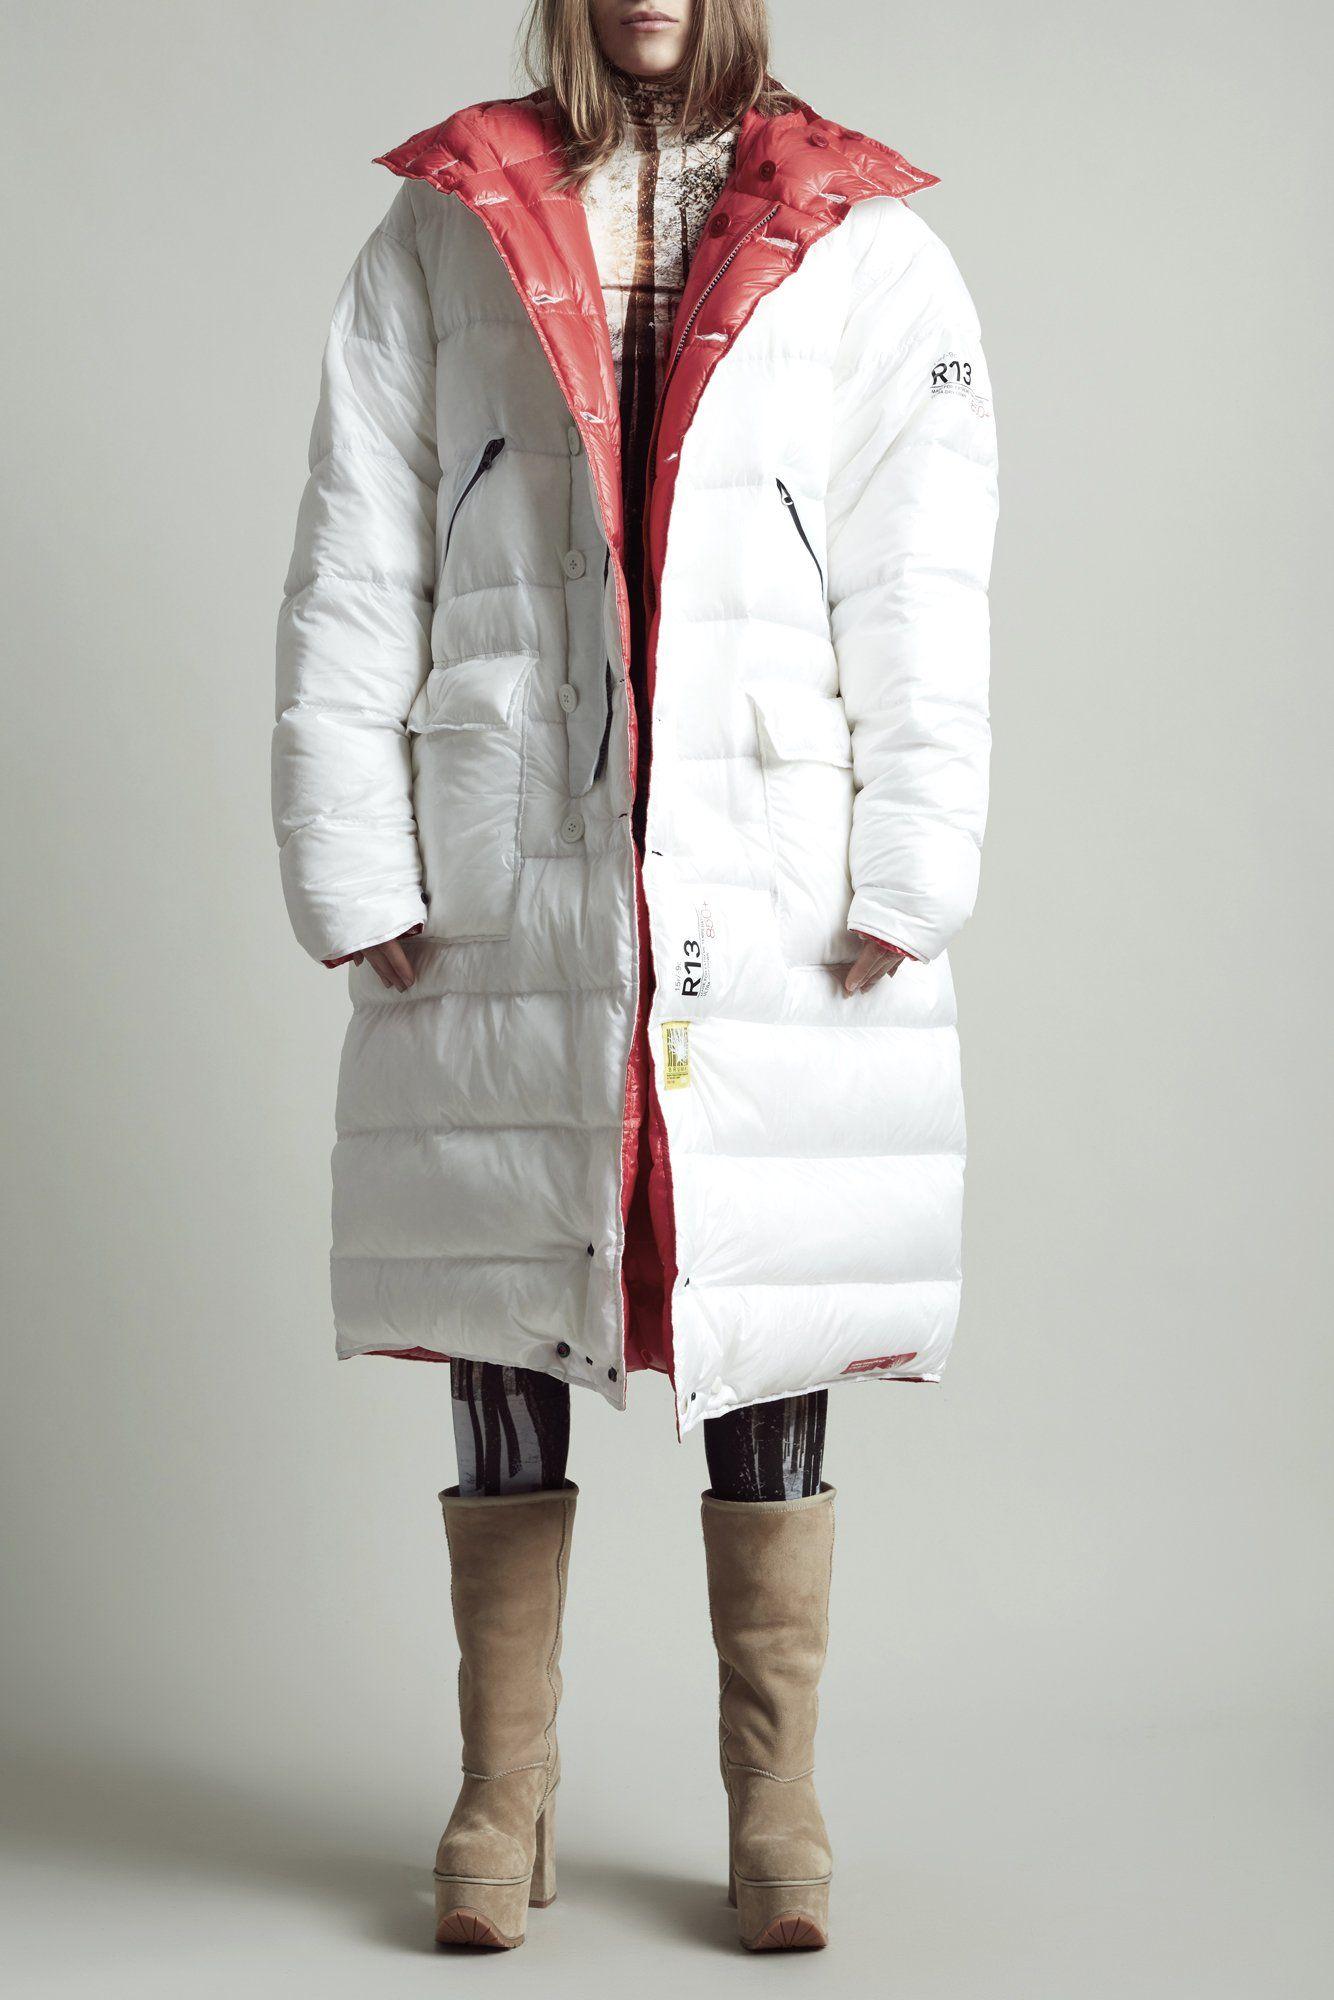 Long Anorak Puffer Jacket White Red Long Anorak Jackets Puffer Jackets [ 2000 x 1334 Pixel ]